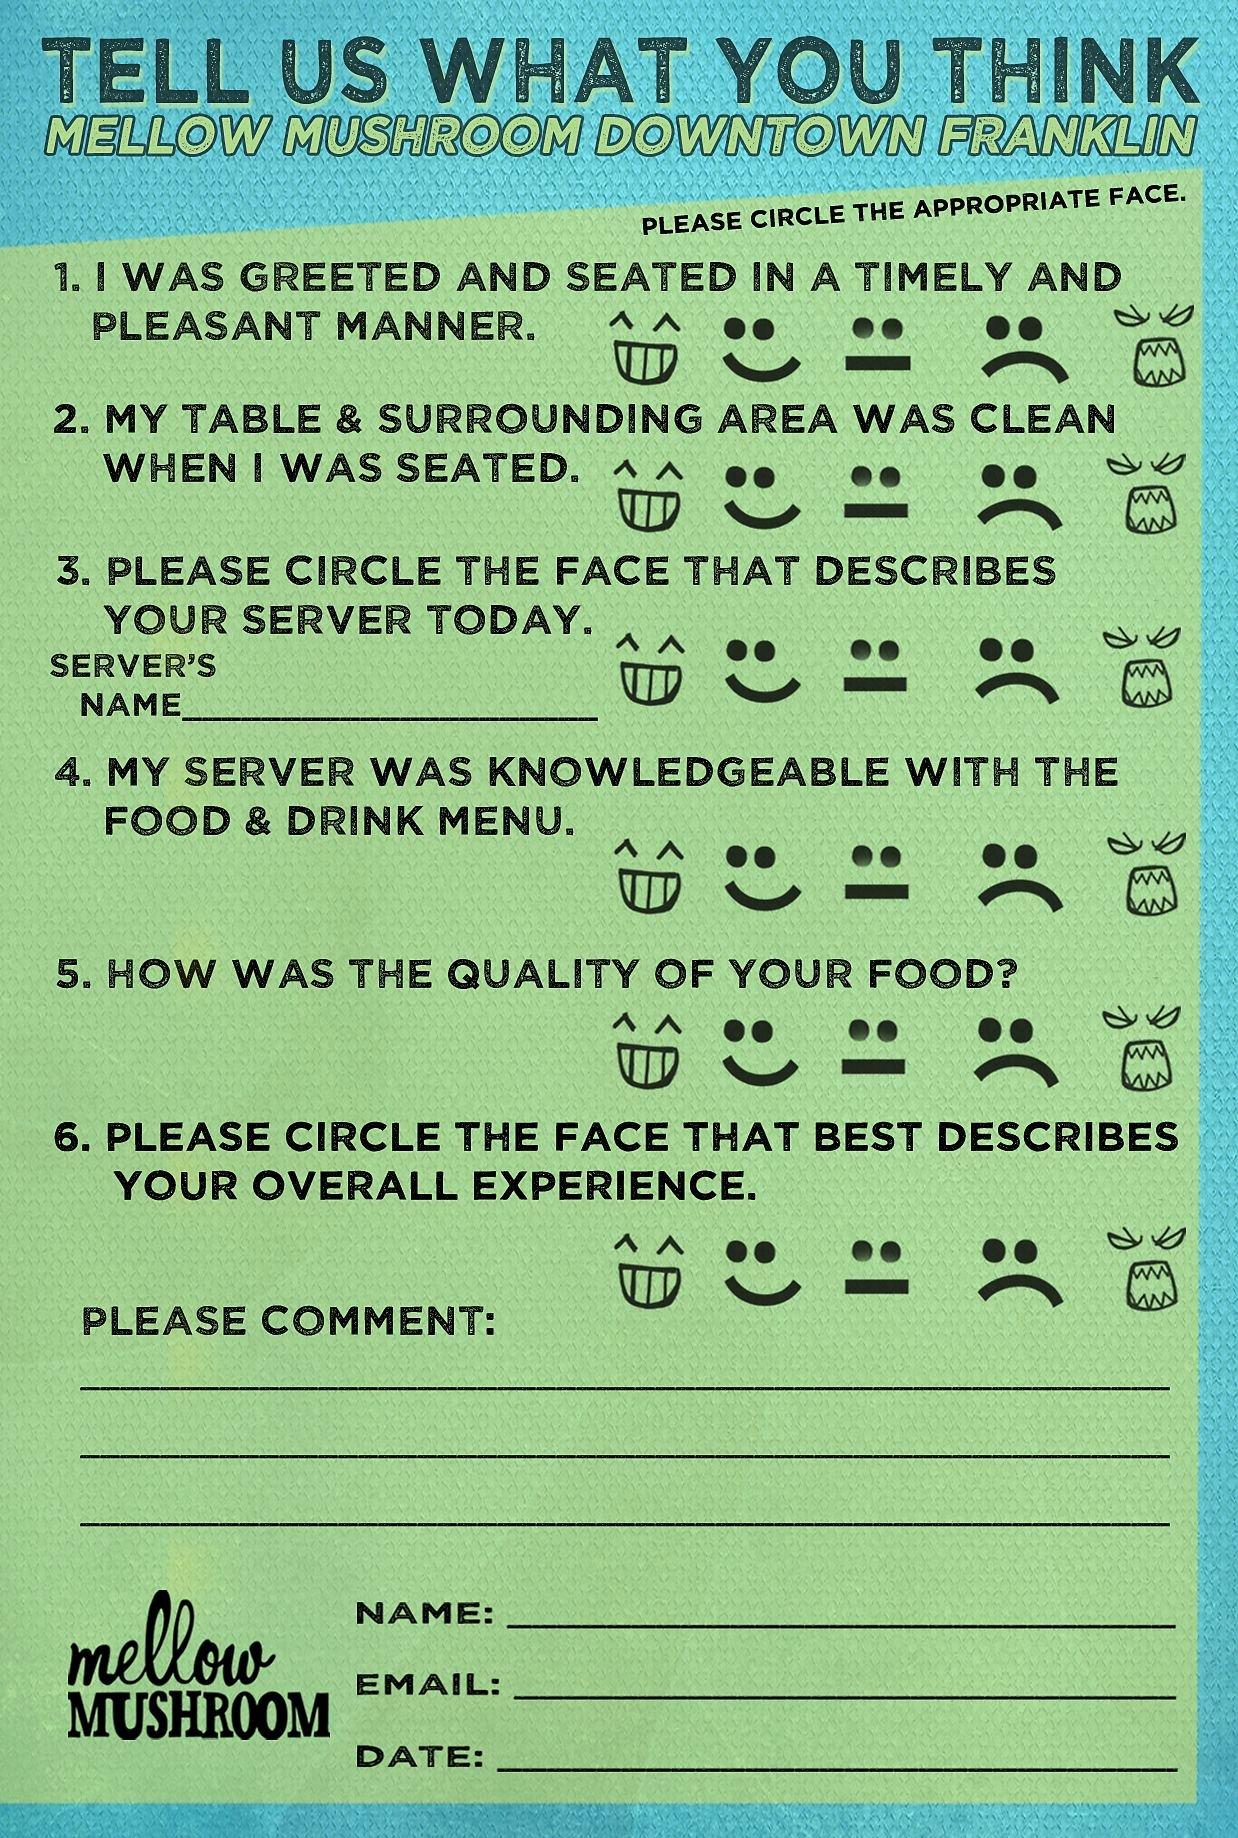 Restaurant Comment Card Template Free Elegant Mellow Mushroom Ment Card My Design Work